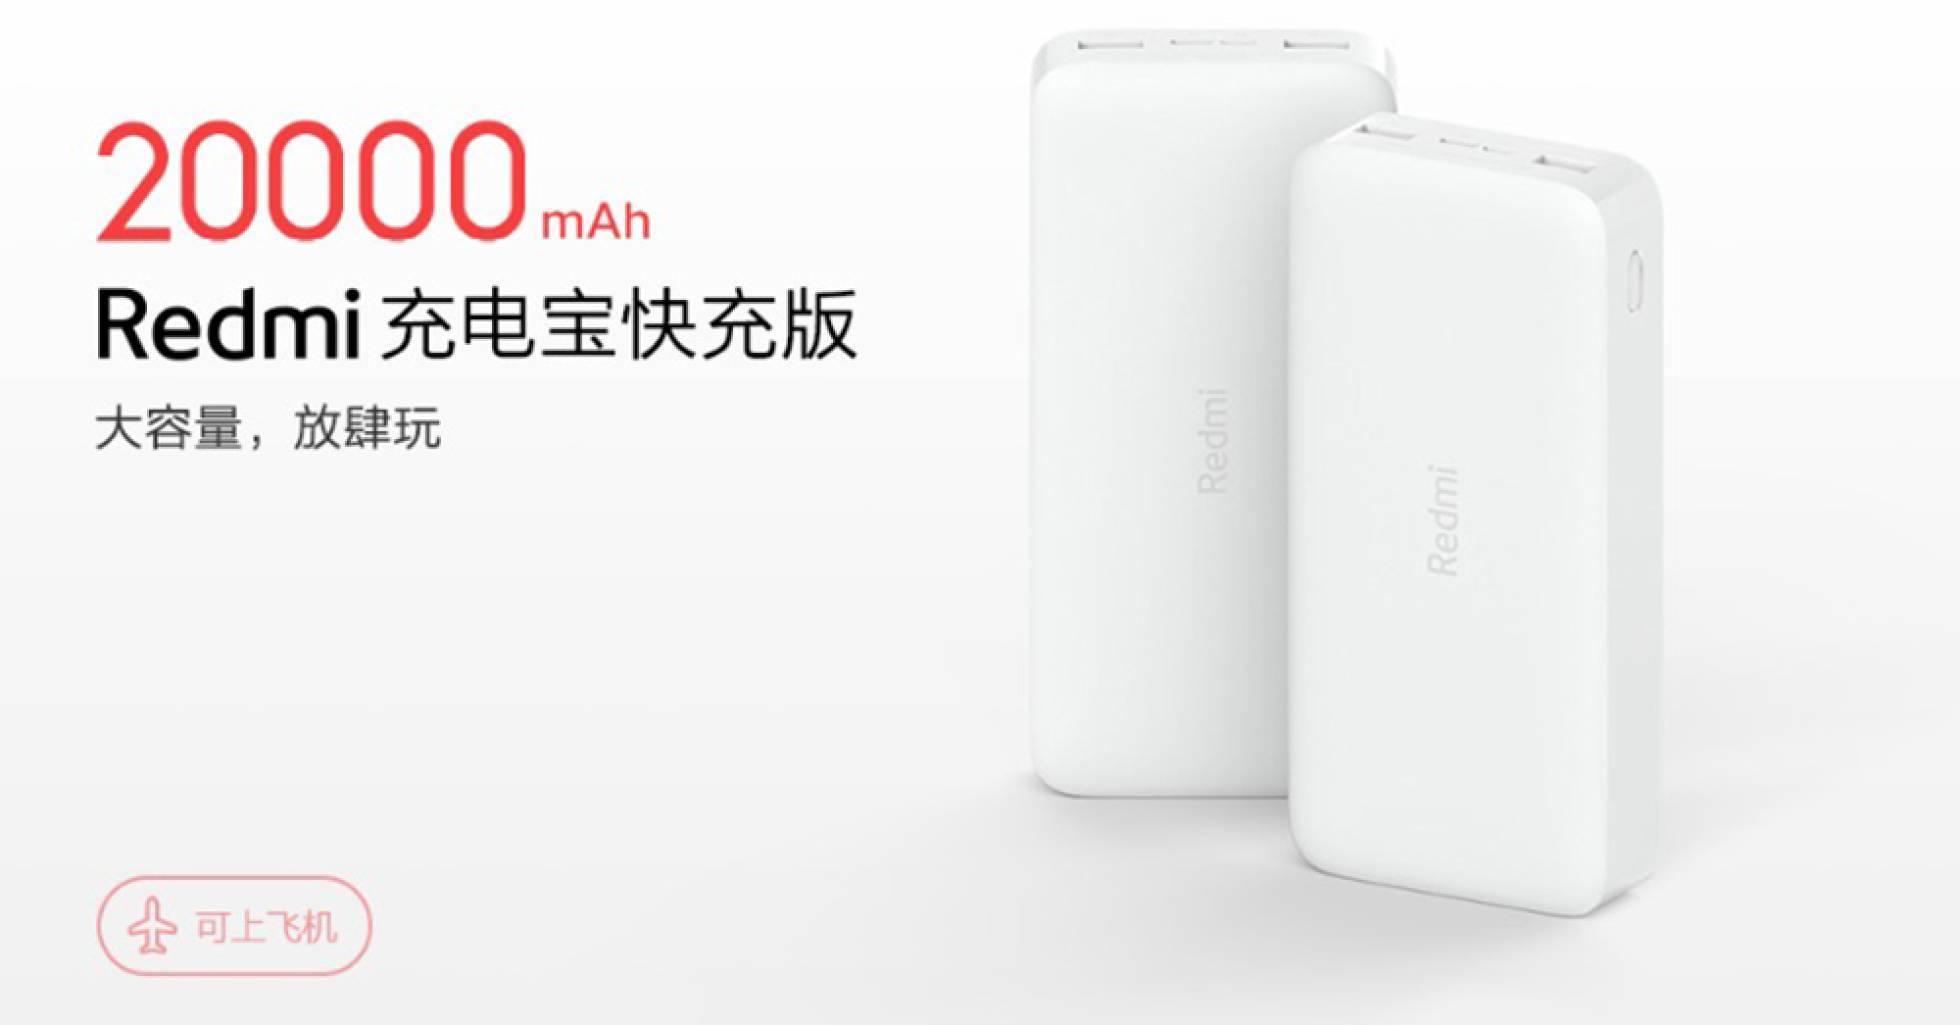 Redmi-Powerbank-smartphone-01